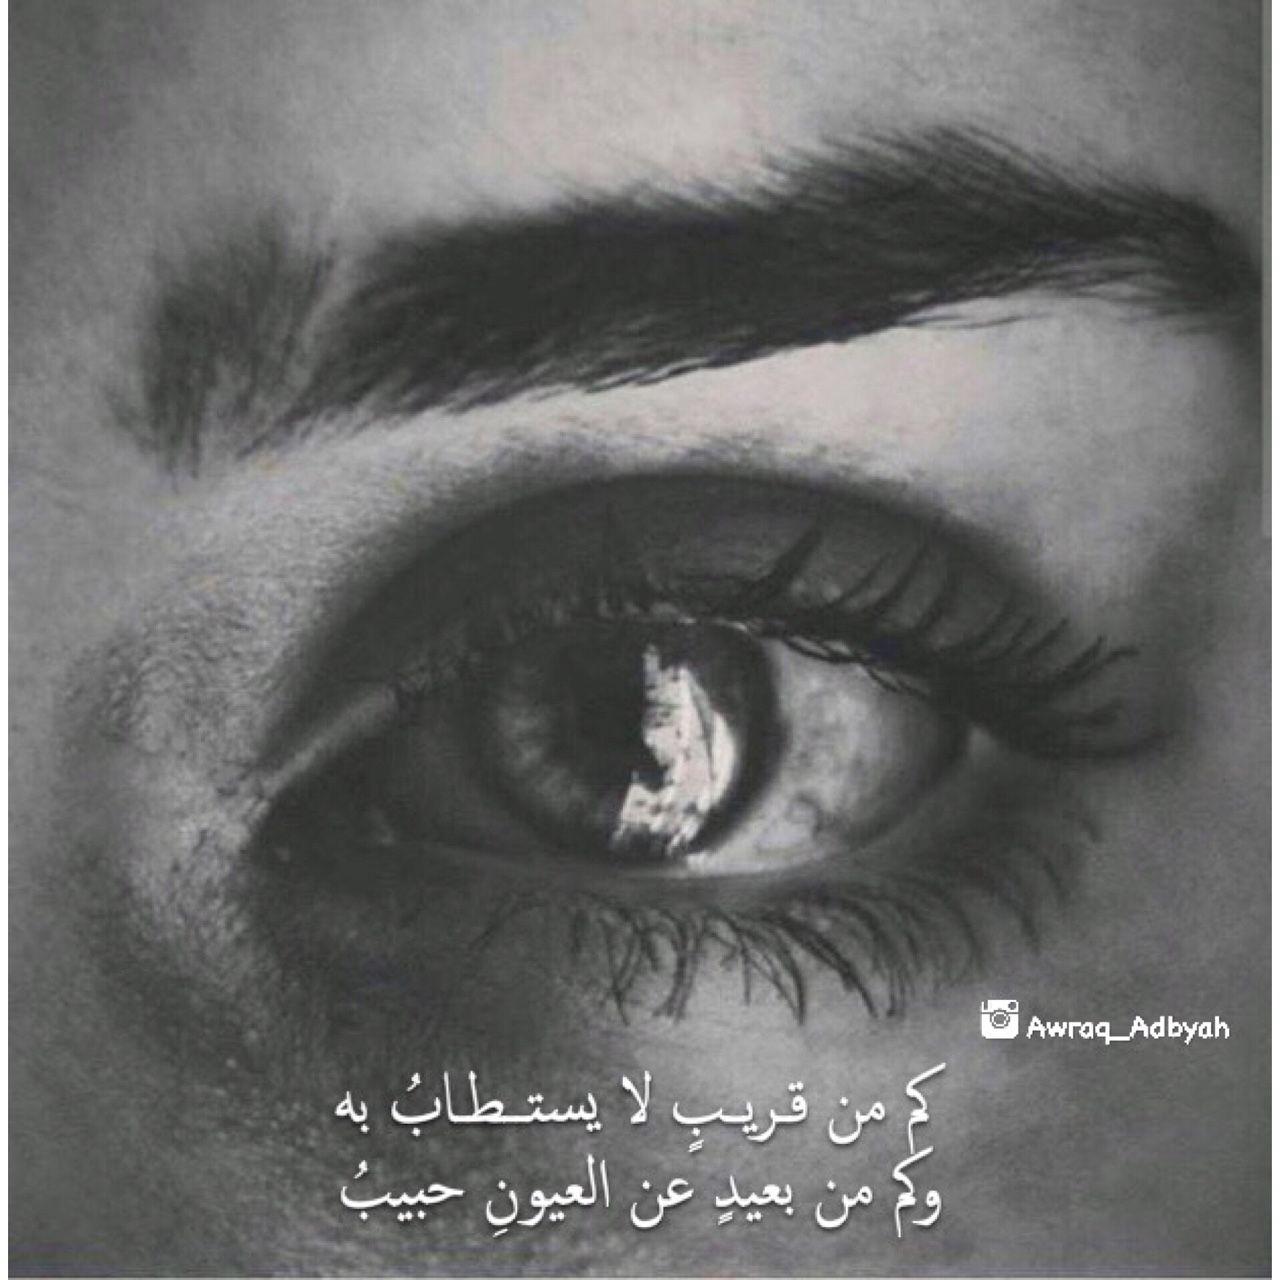 Awraq Adbyah Weird Words Arabic Love Quotes Arabic Quotes